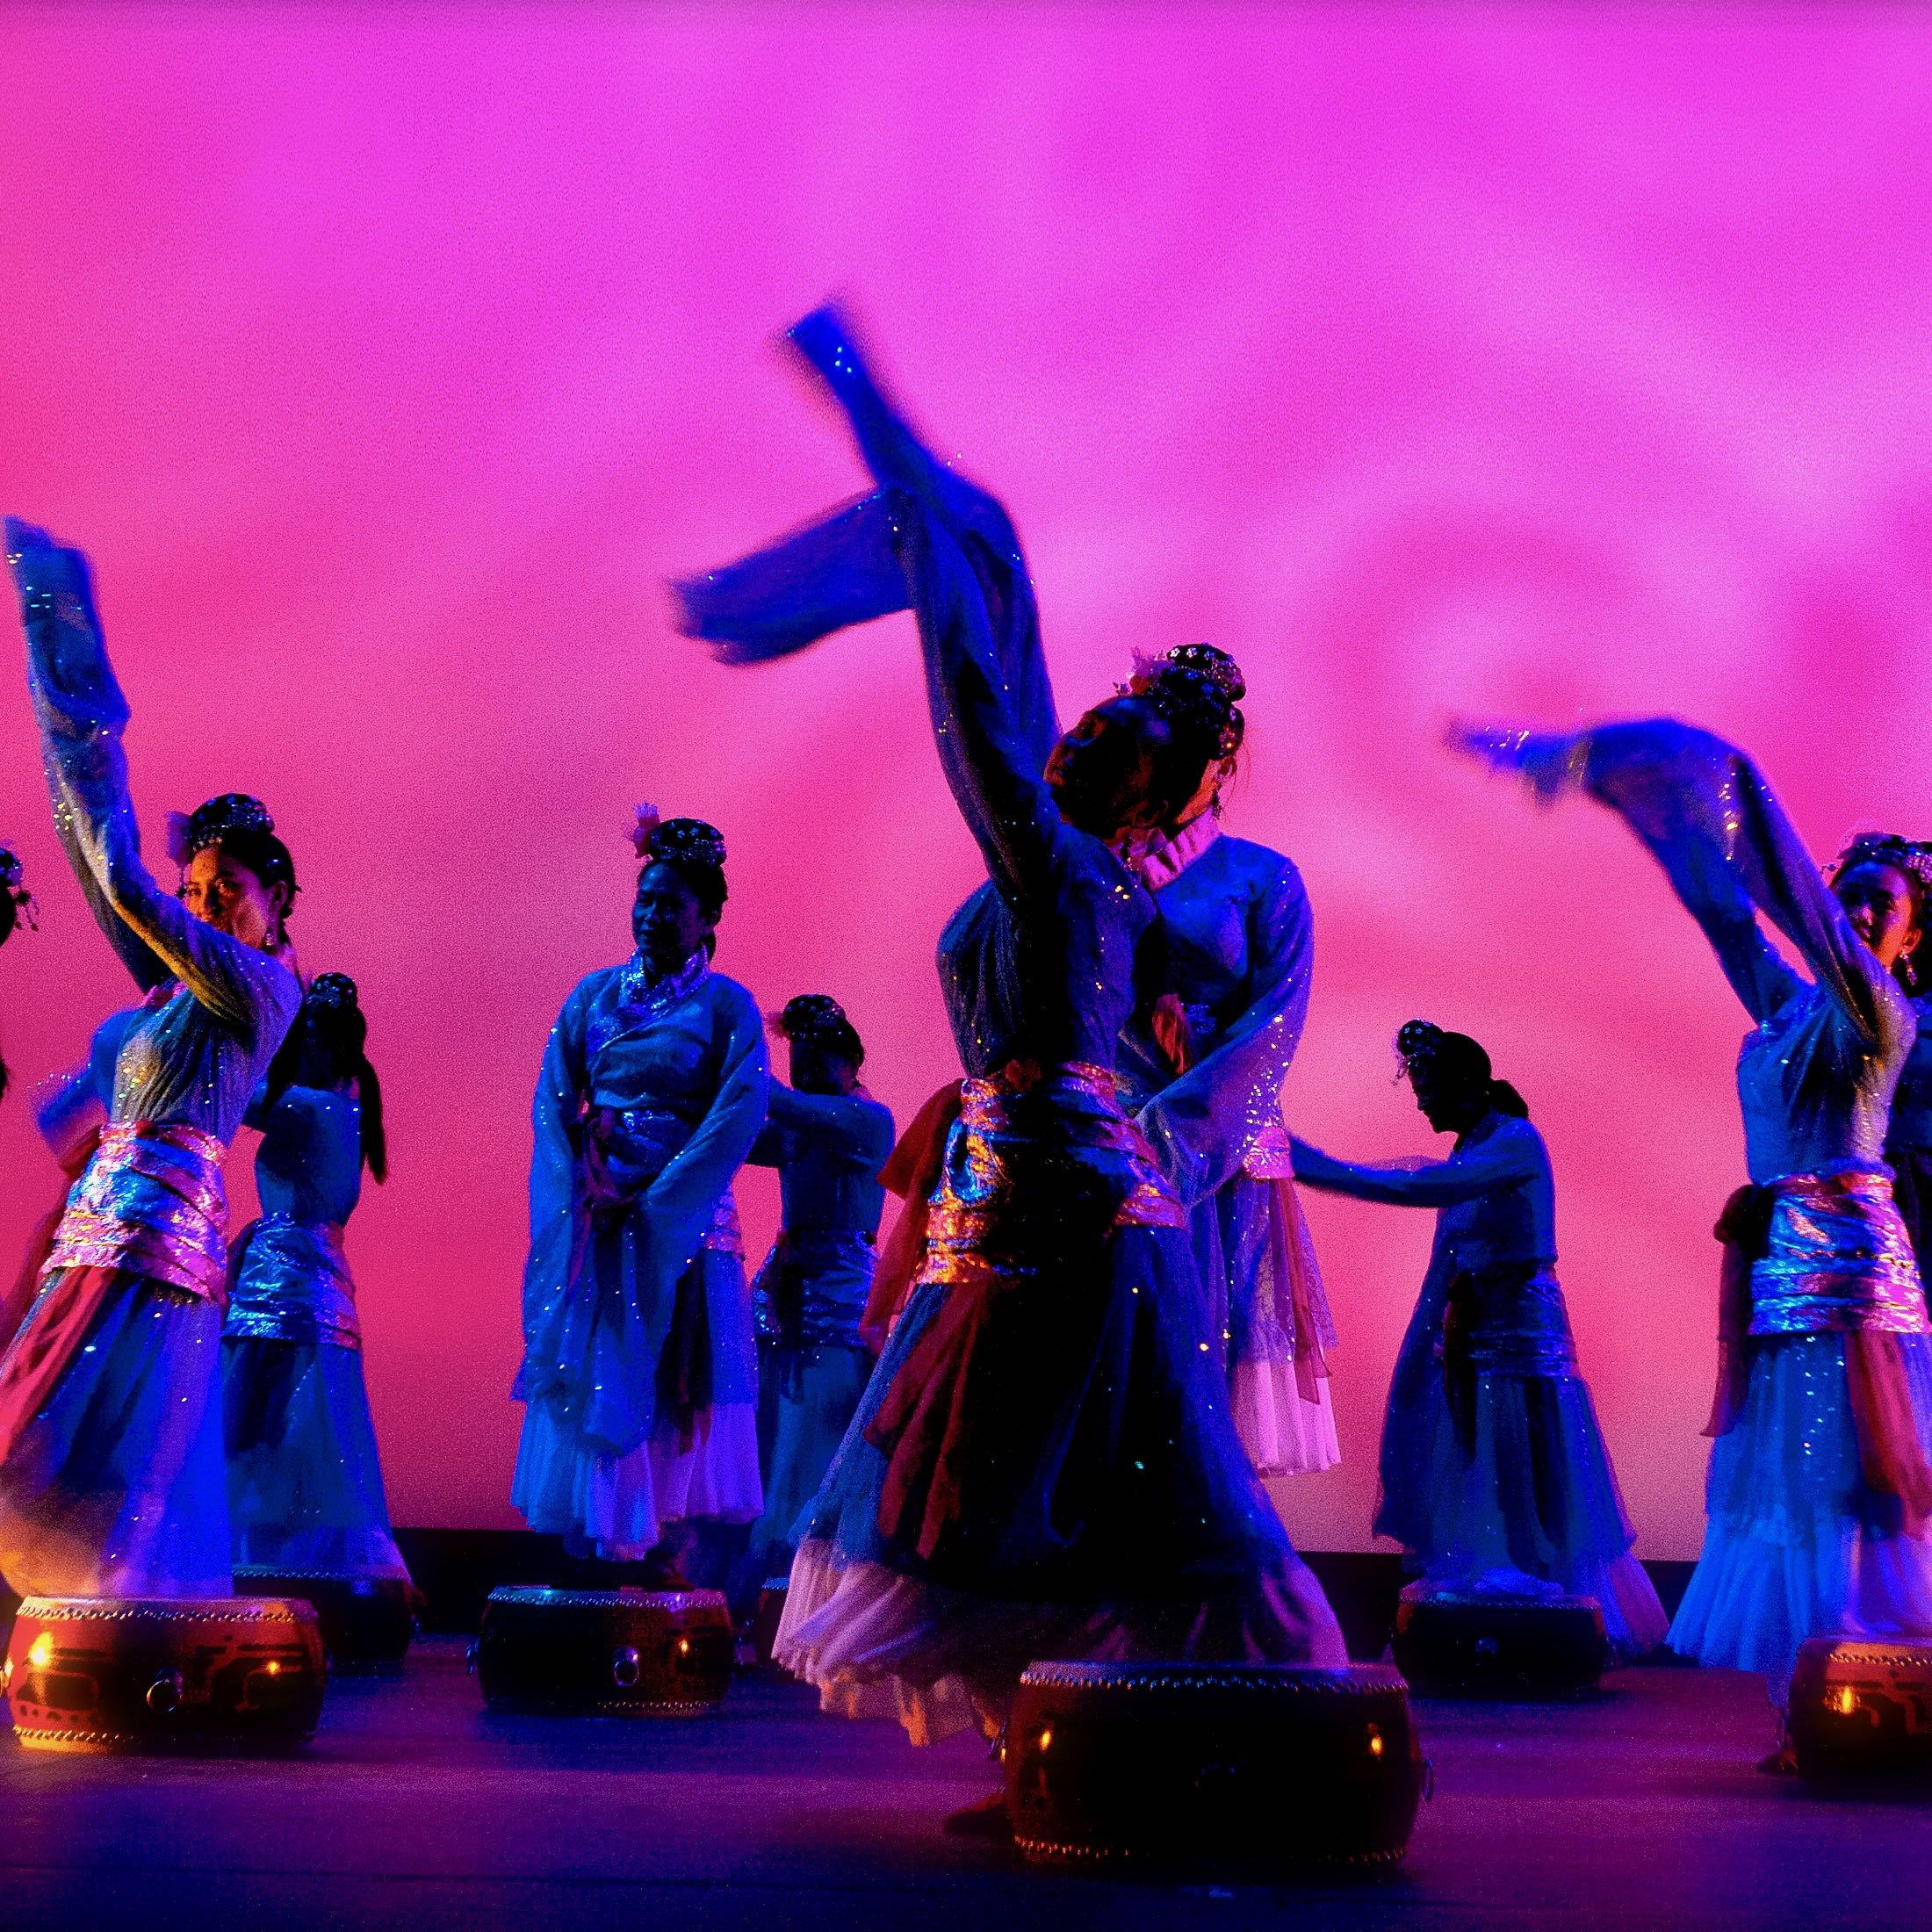 drum-dance-of-the-han-dynasty - 3.jpg